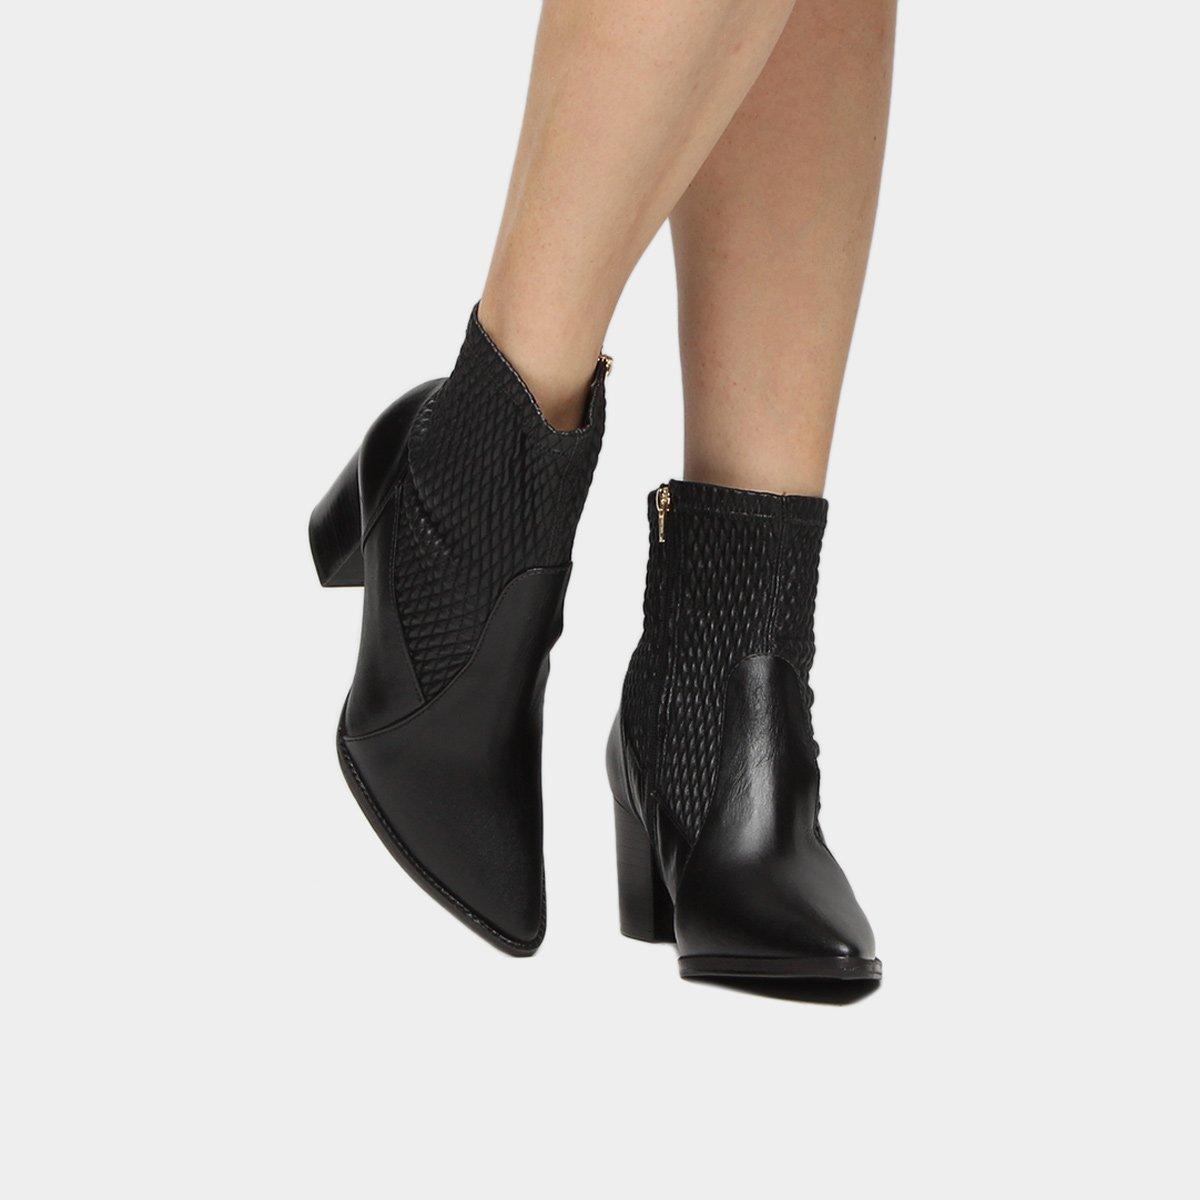 Salto Grosso Couro Shoestock Bota Feminina Colméia Bota Couro Preto Curta wBgfSW4Uxq